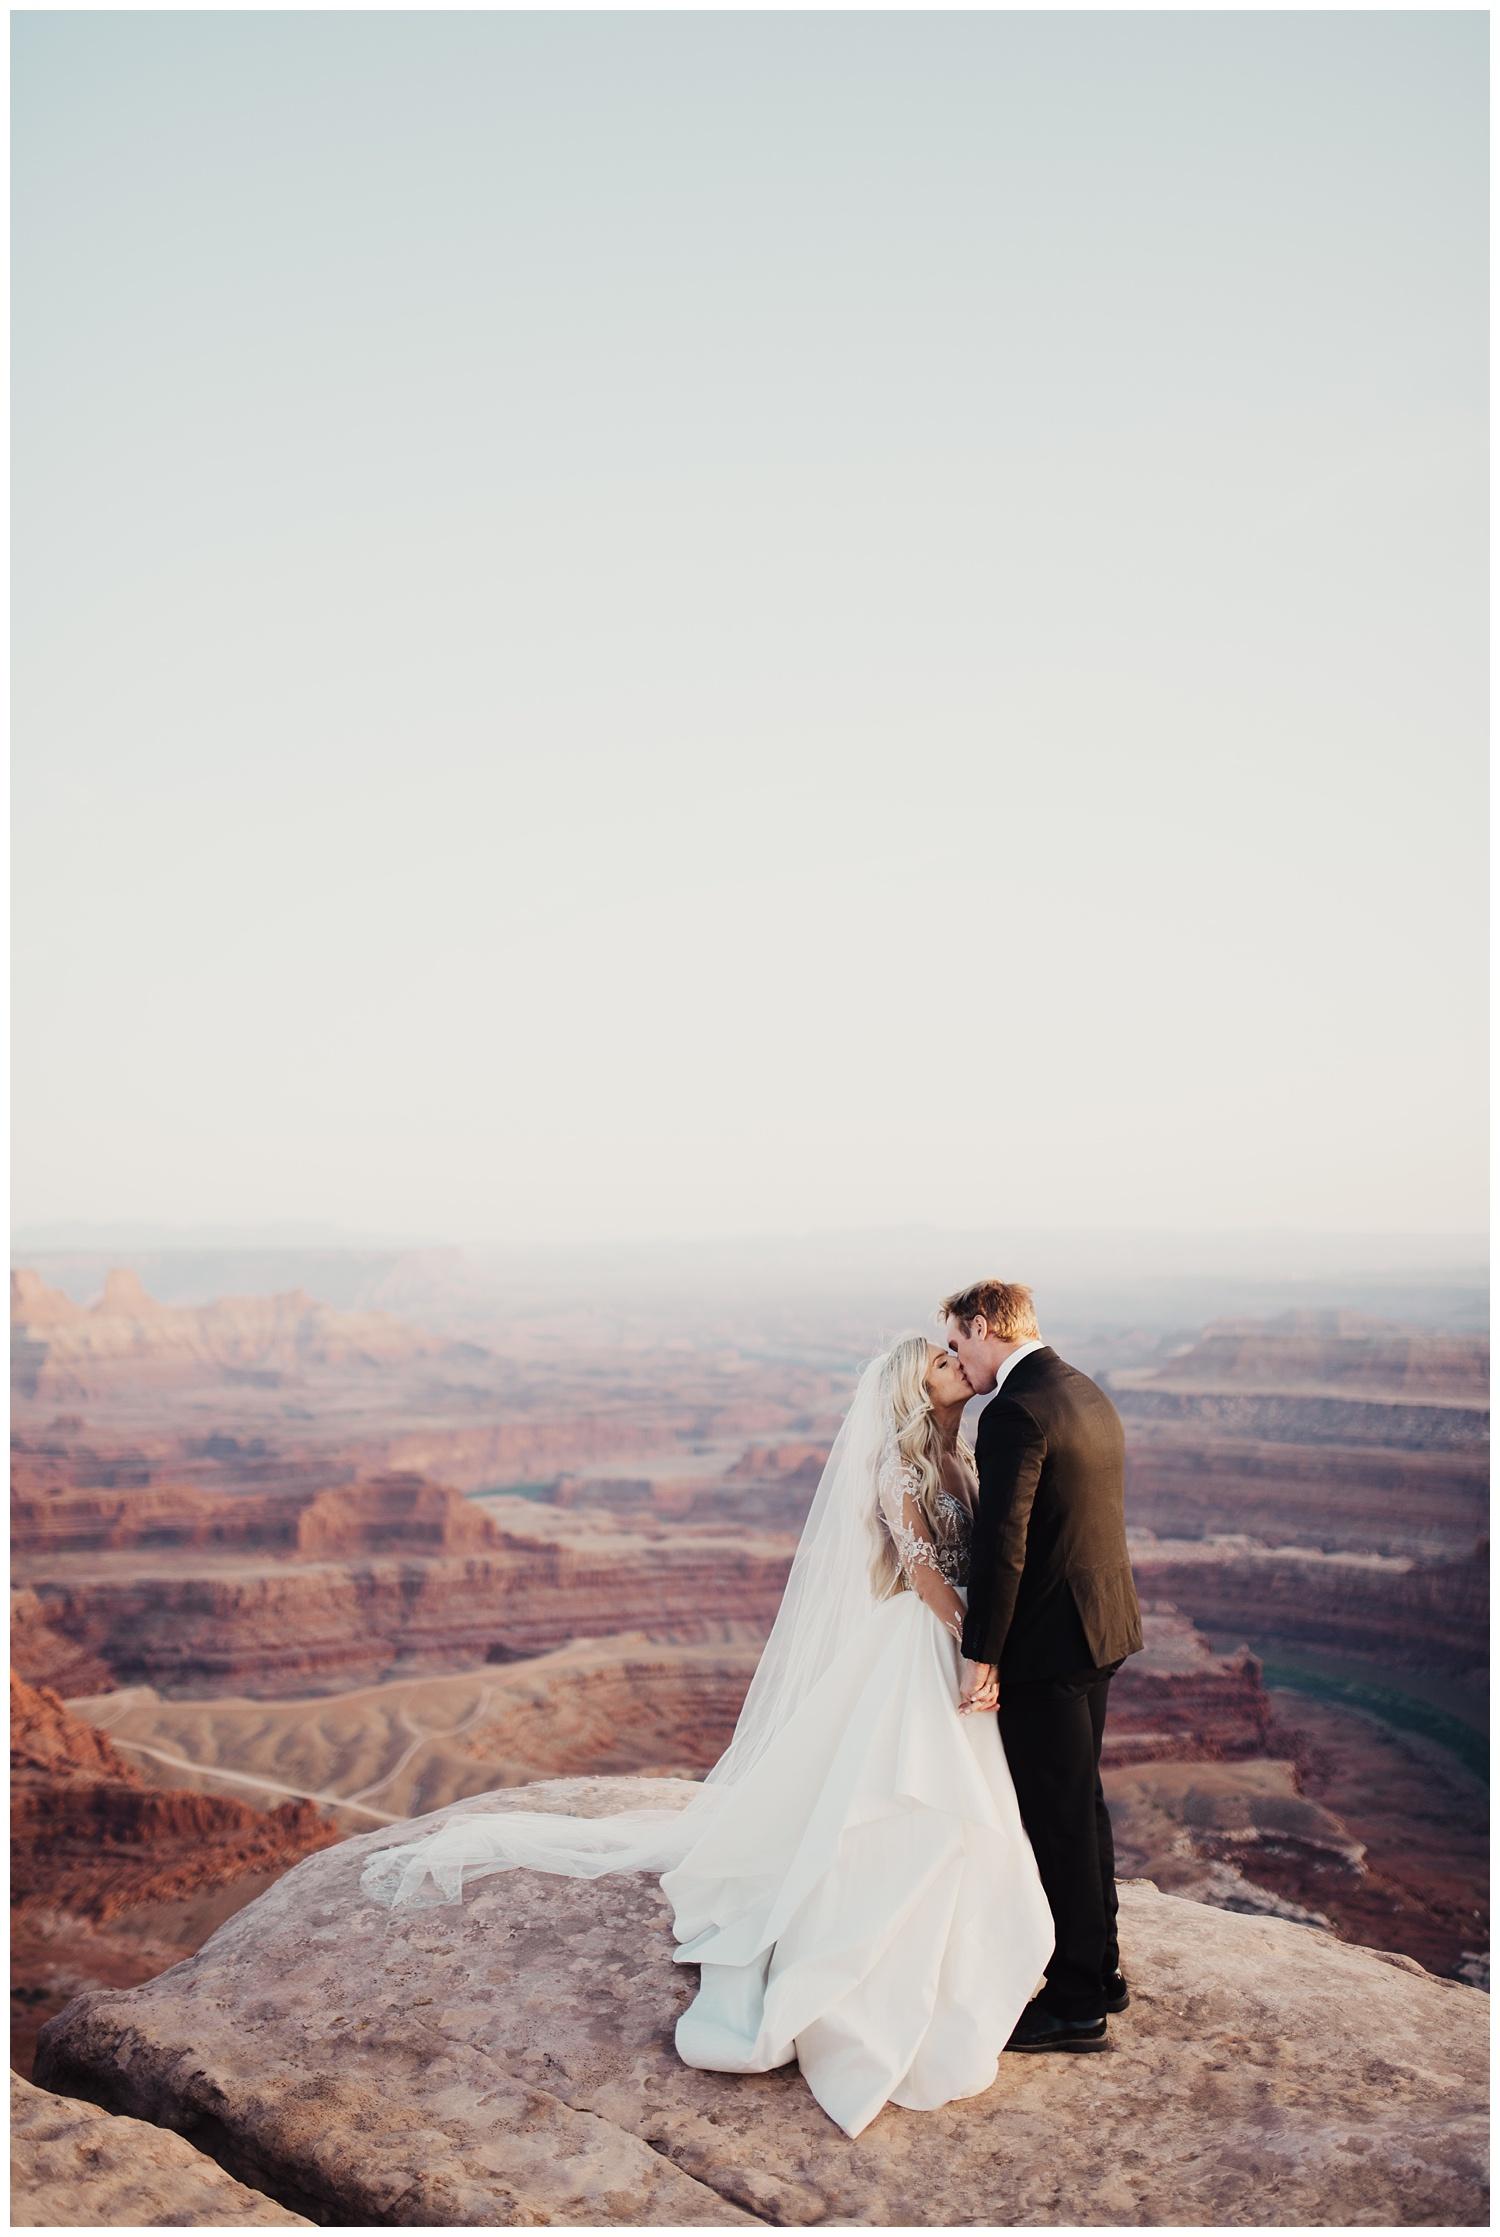 edenstraderphoto-weddingphotographer_0819.jpg